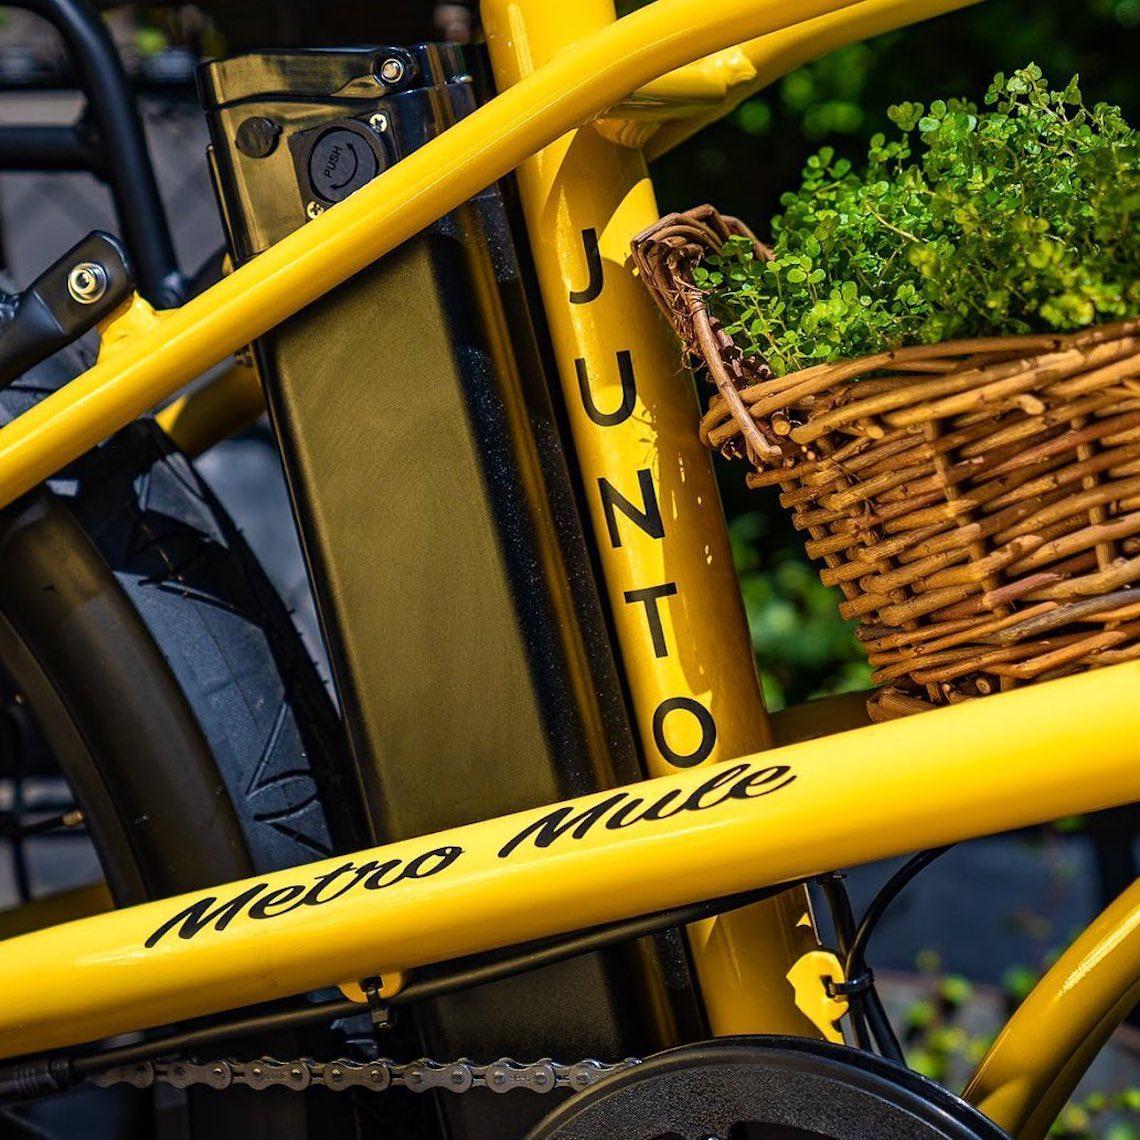 JUNTO MetroMule cargo_e-bike_6